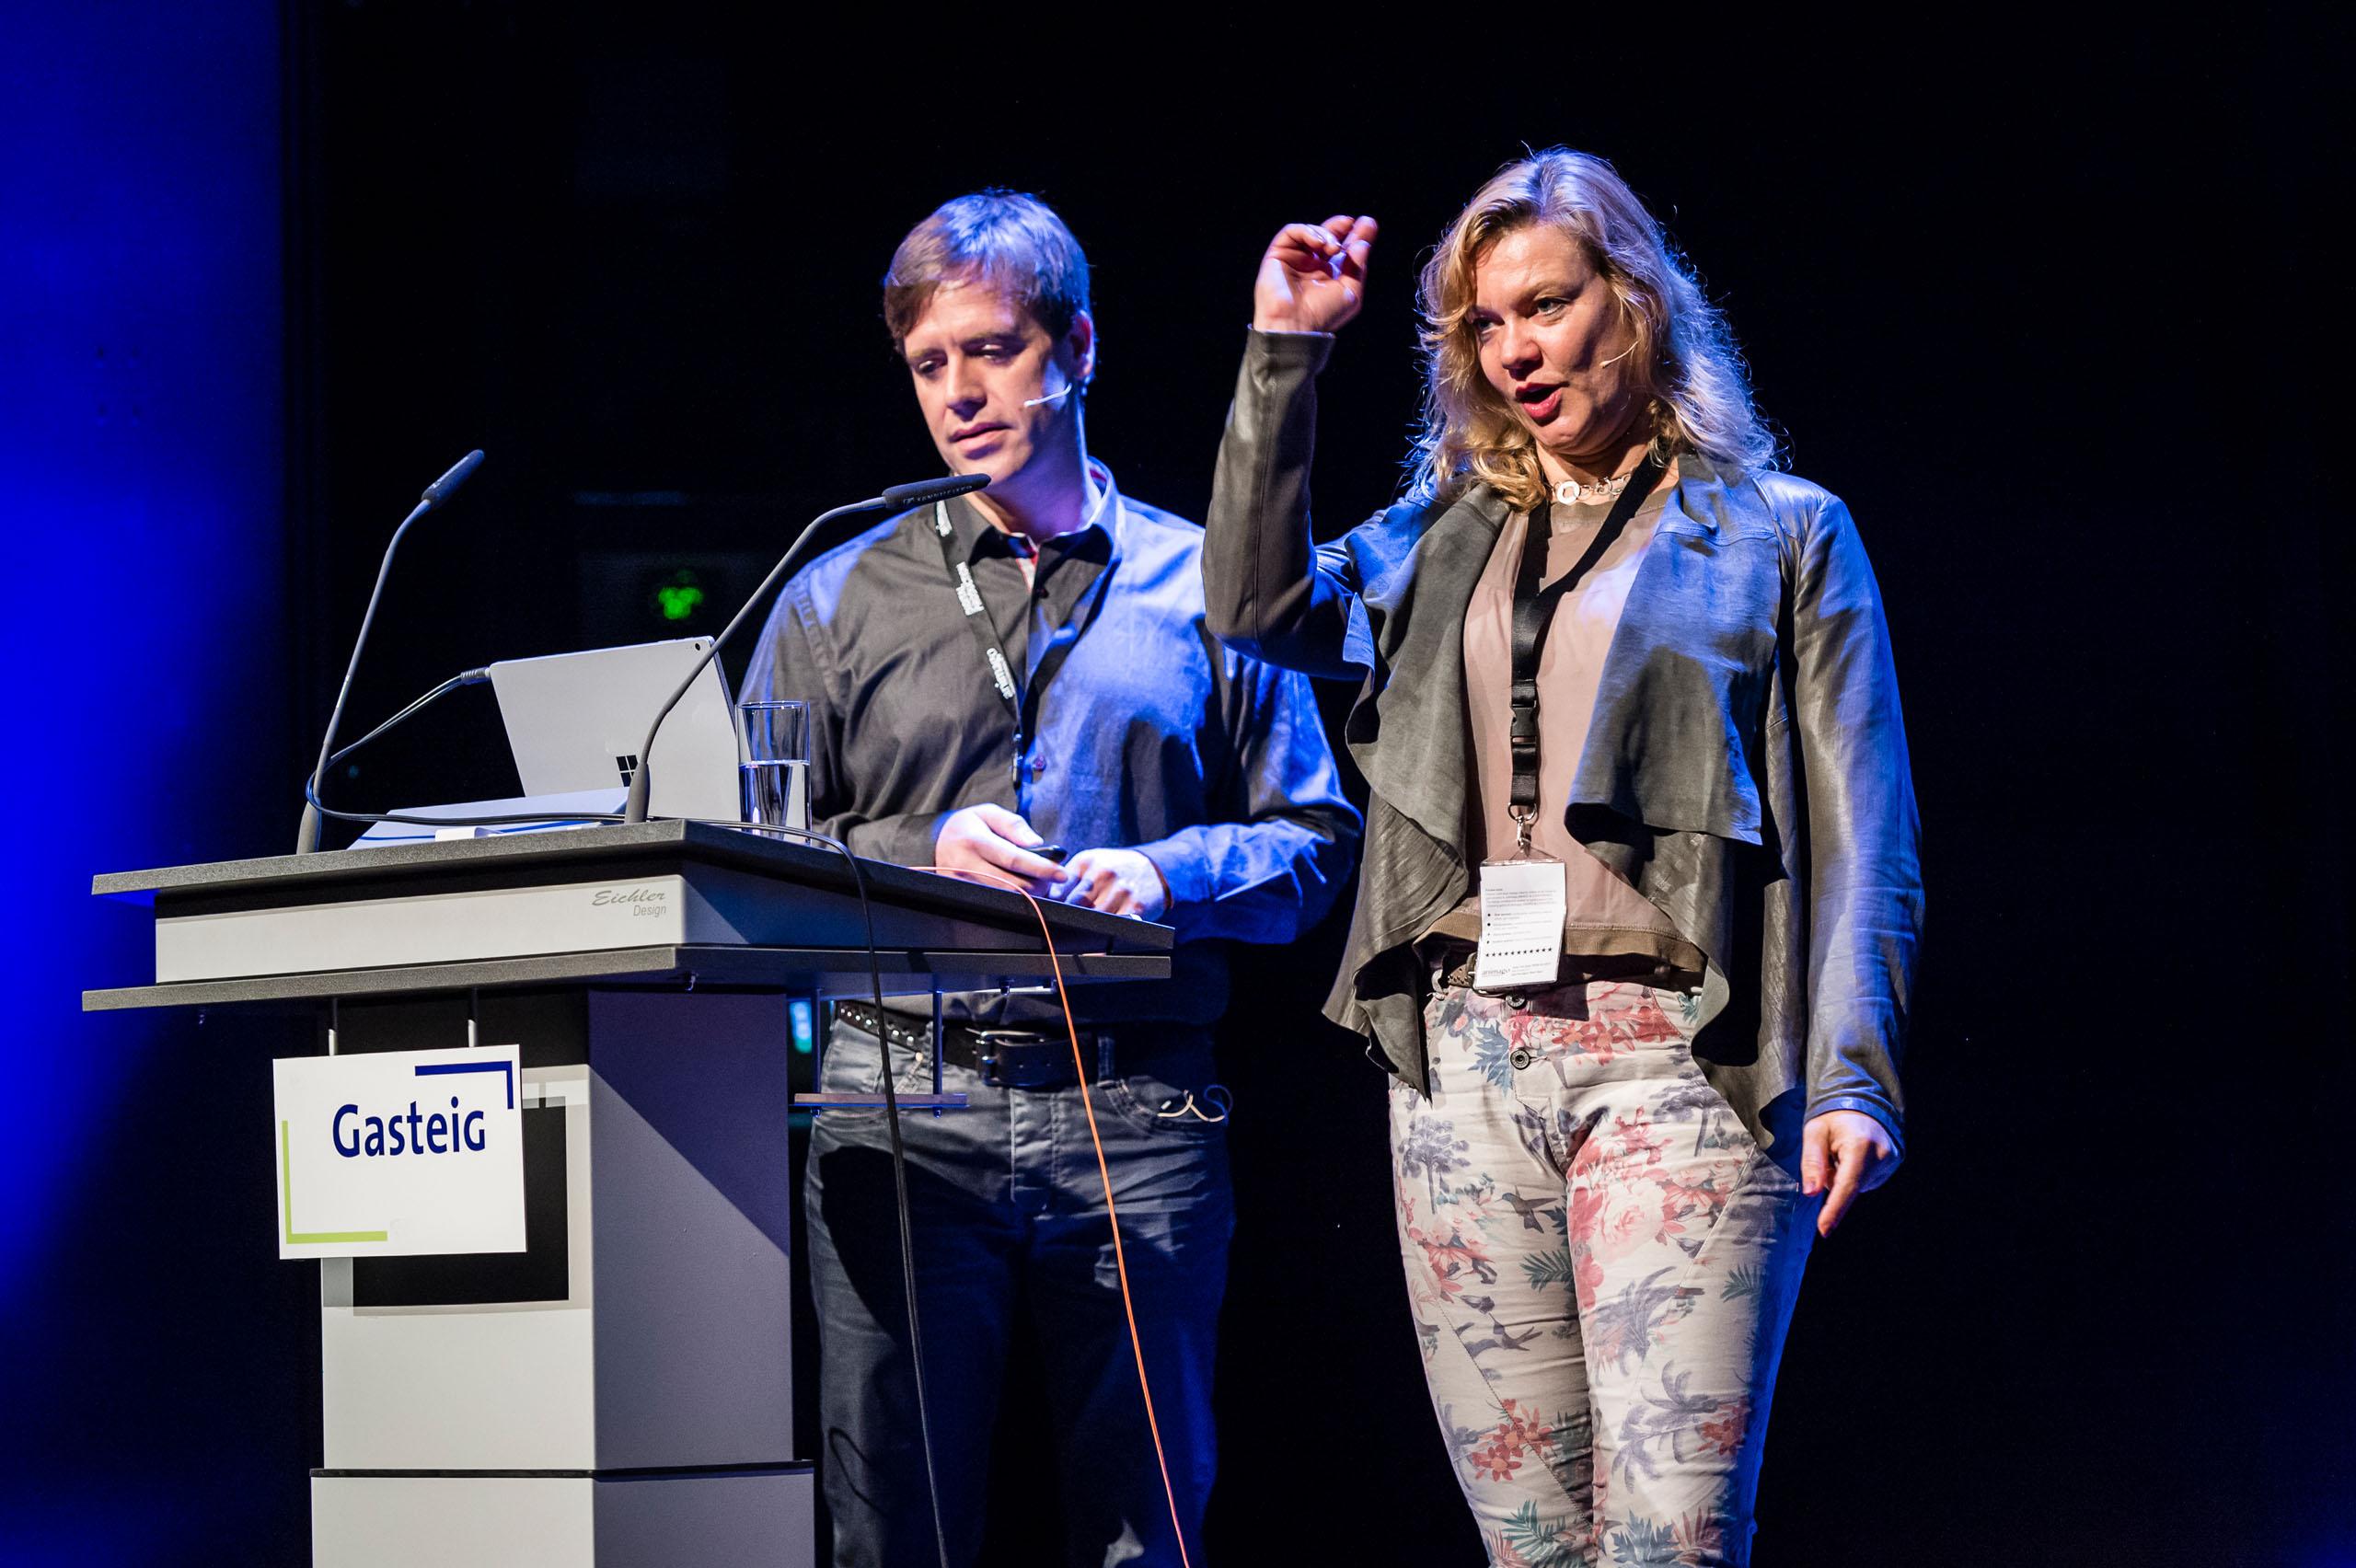 animago Award & Conference, München